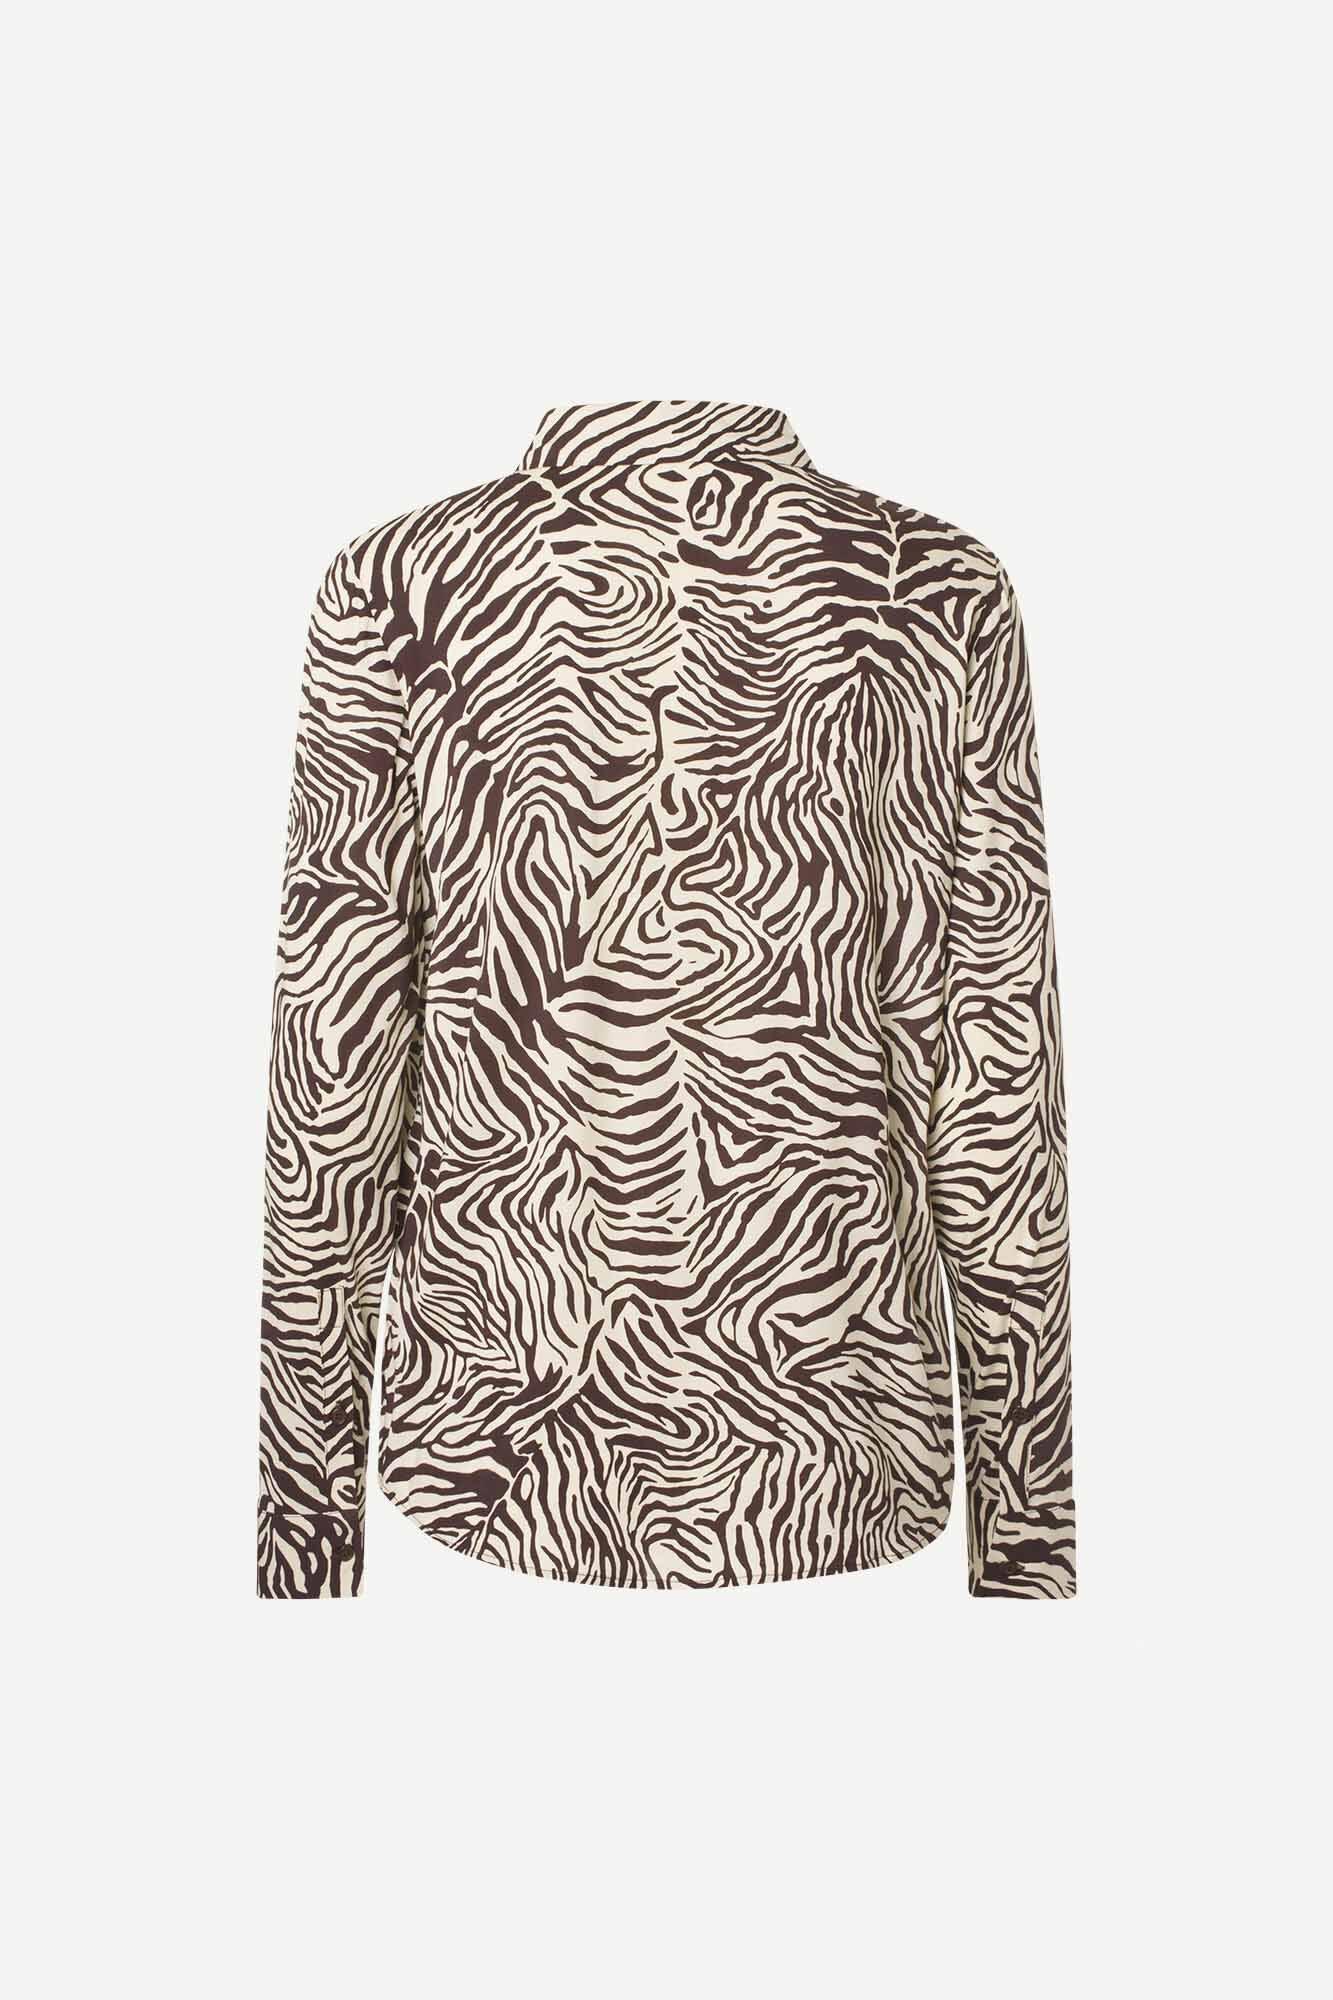 Milly shirt Samsoe,-5